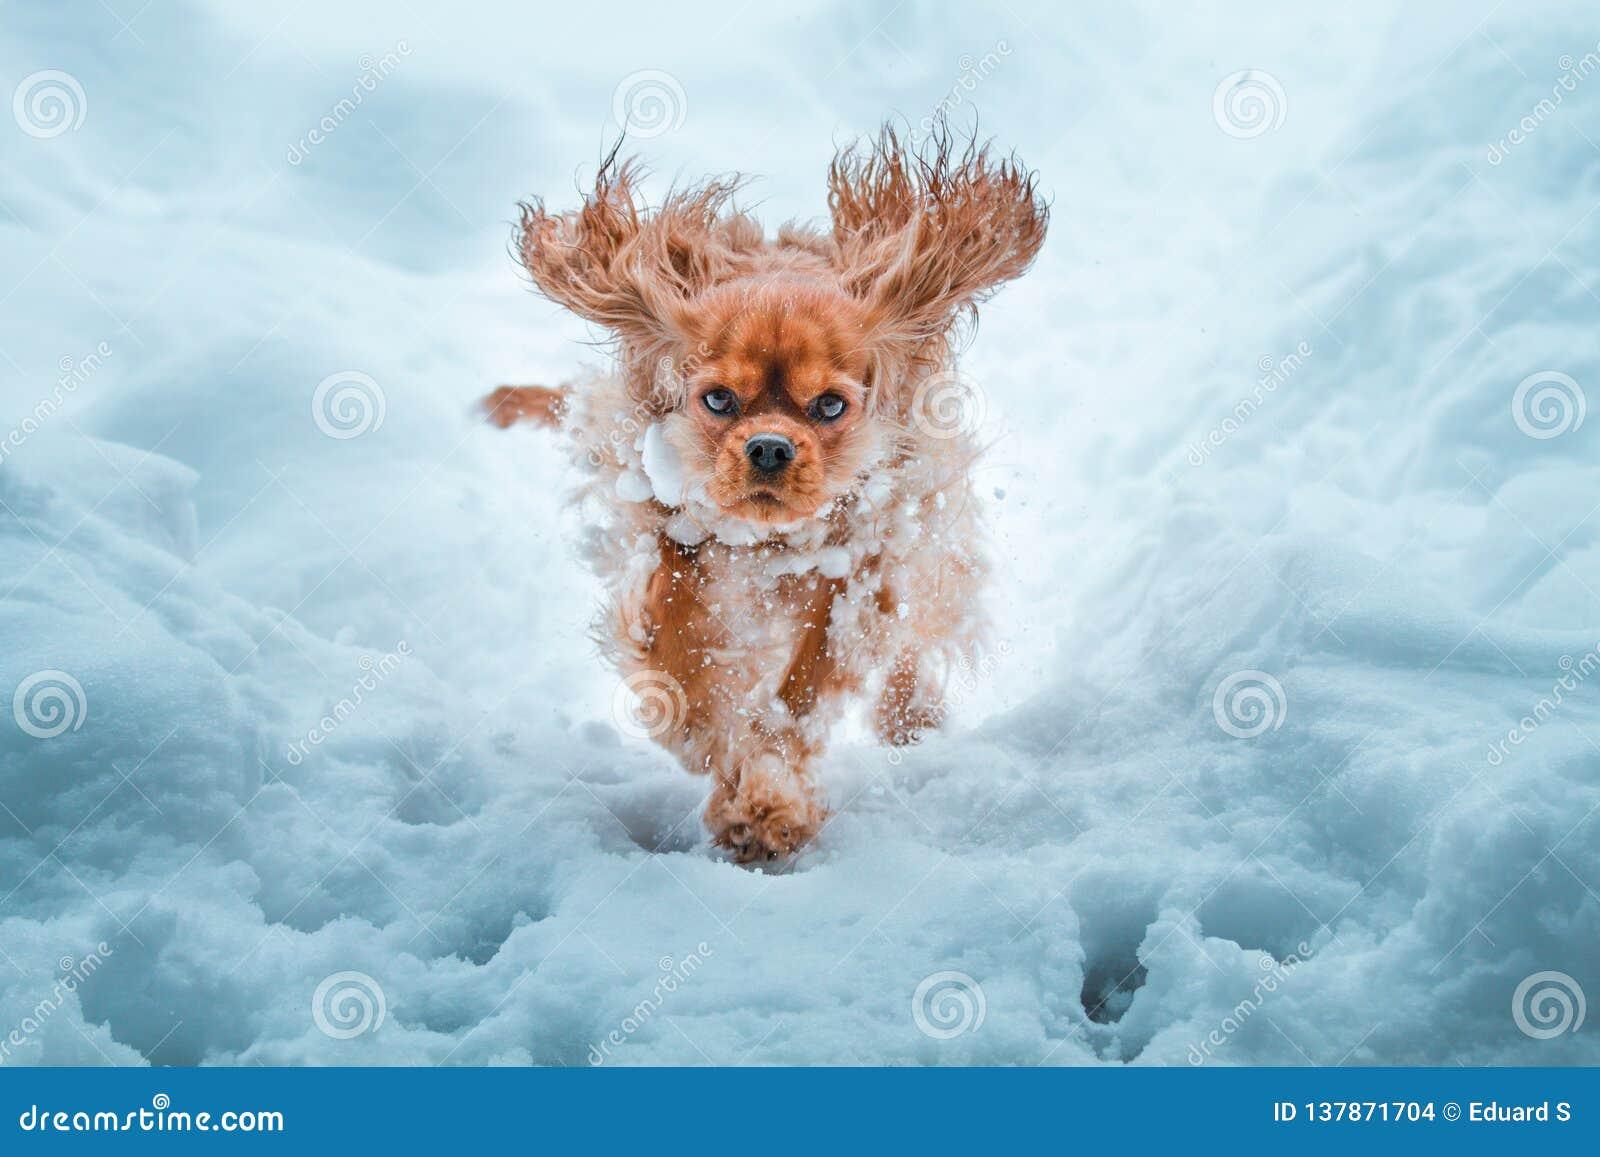 Cavalier King Charles Spaniel dog runnung in winter